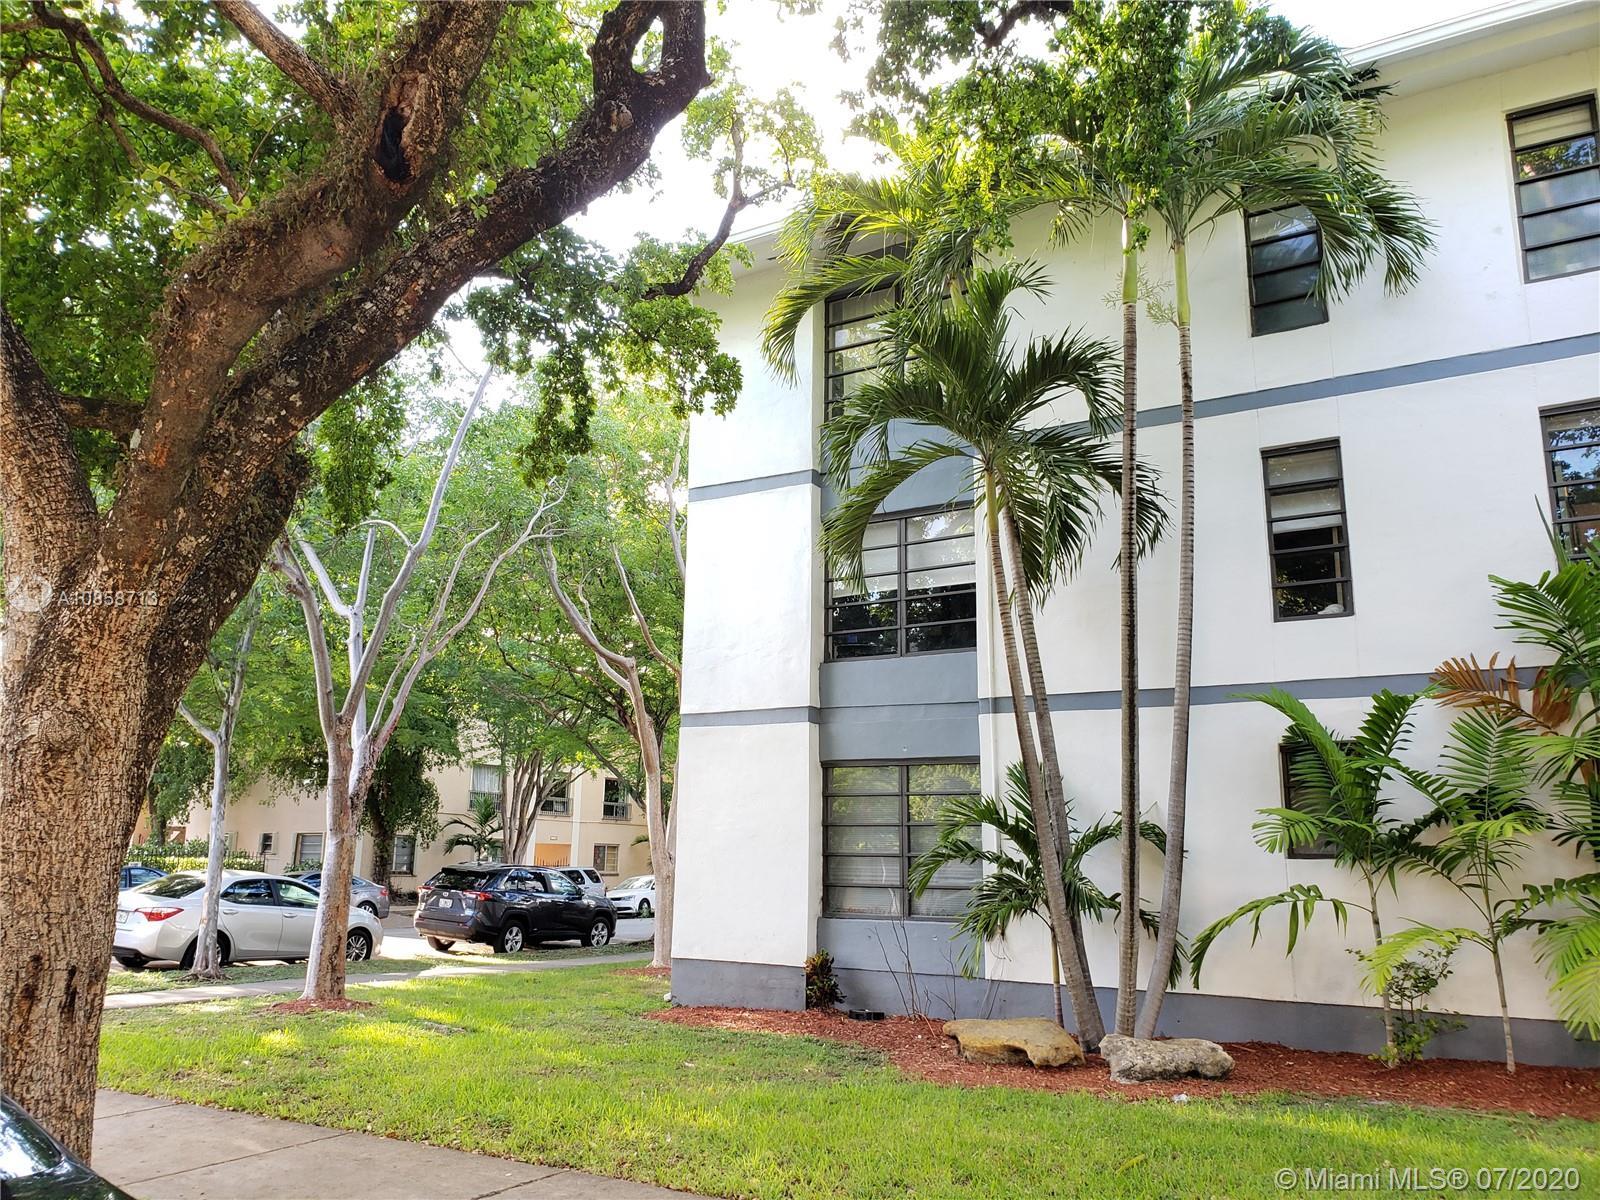 235 Antilla Ave # 8, Coral Gables, Florida 33134, 2 Bedrooms Bedrooms, ,3 BathroomsBathrooms,Residential,For Sale,235 Antilla Ave # 8,A10858713